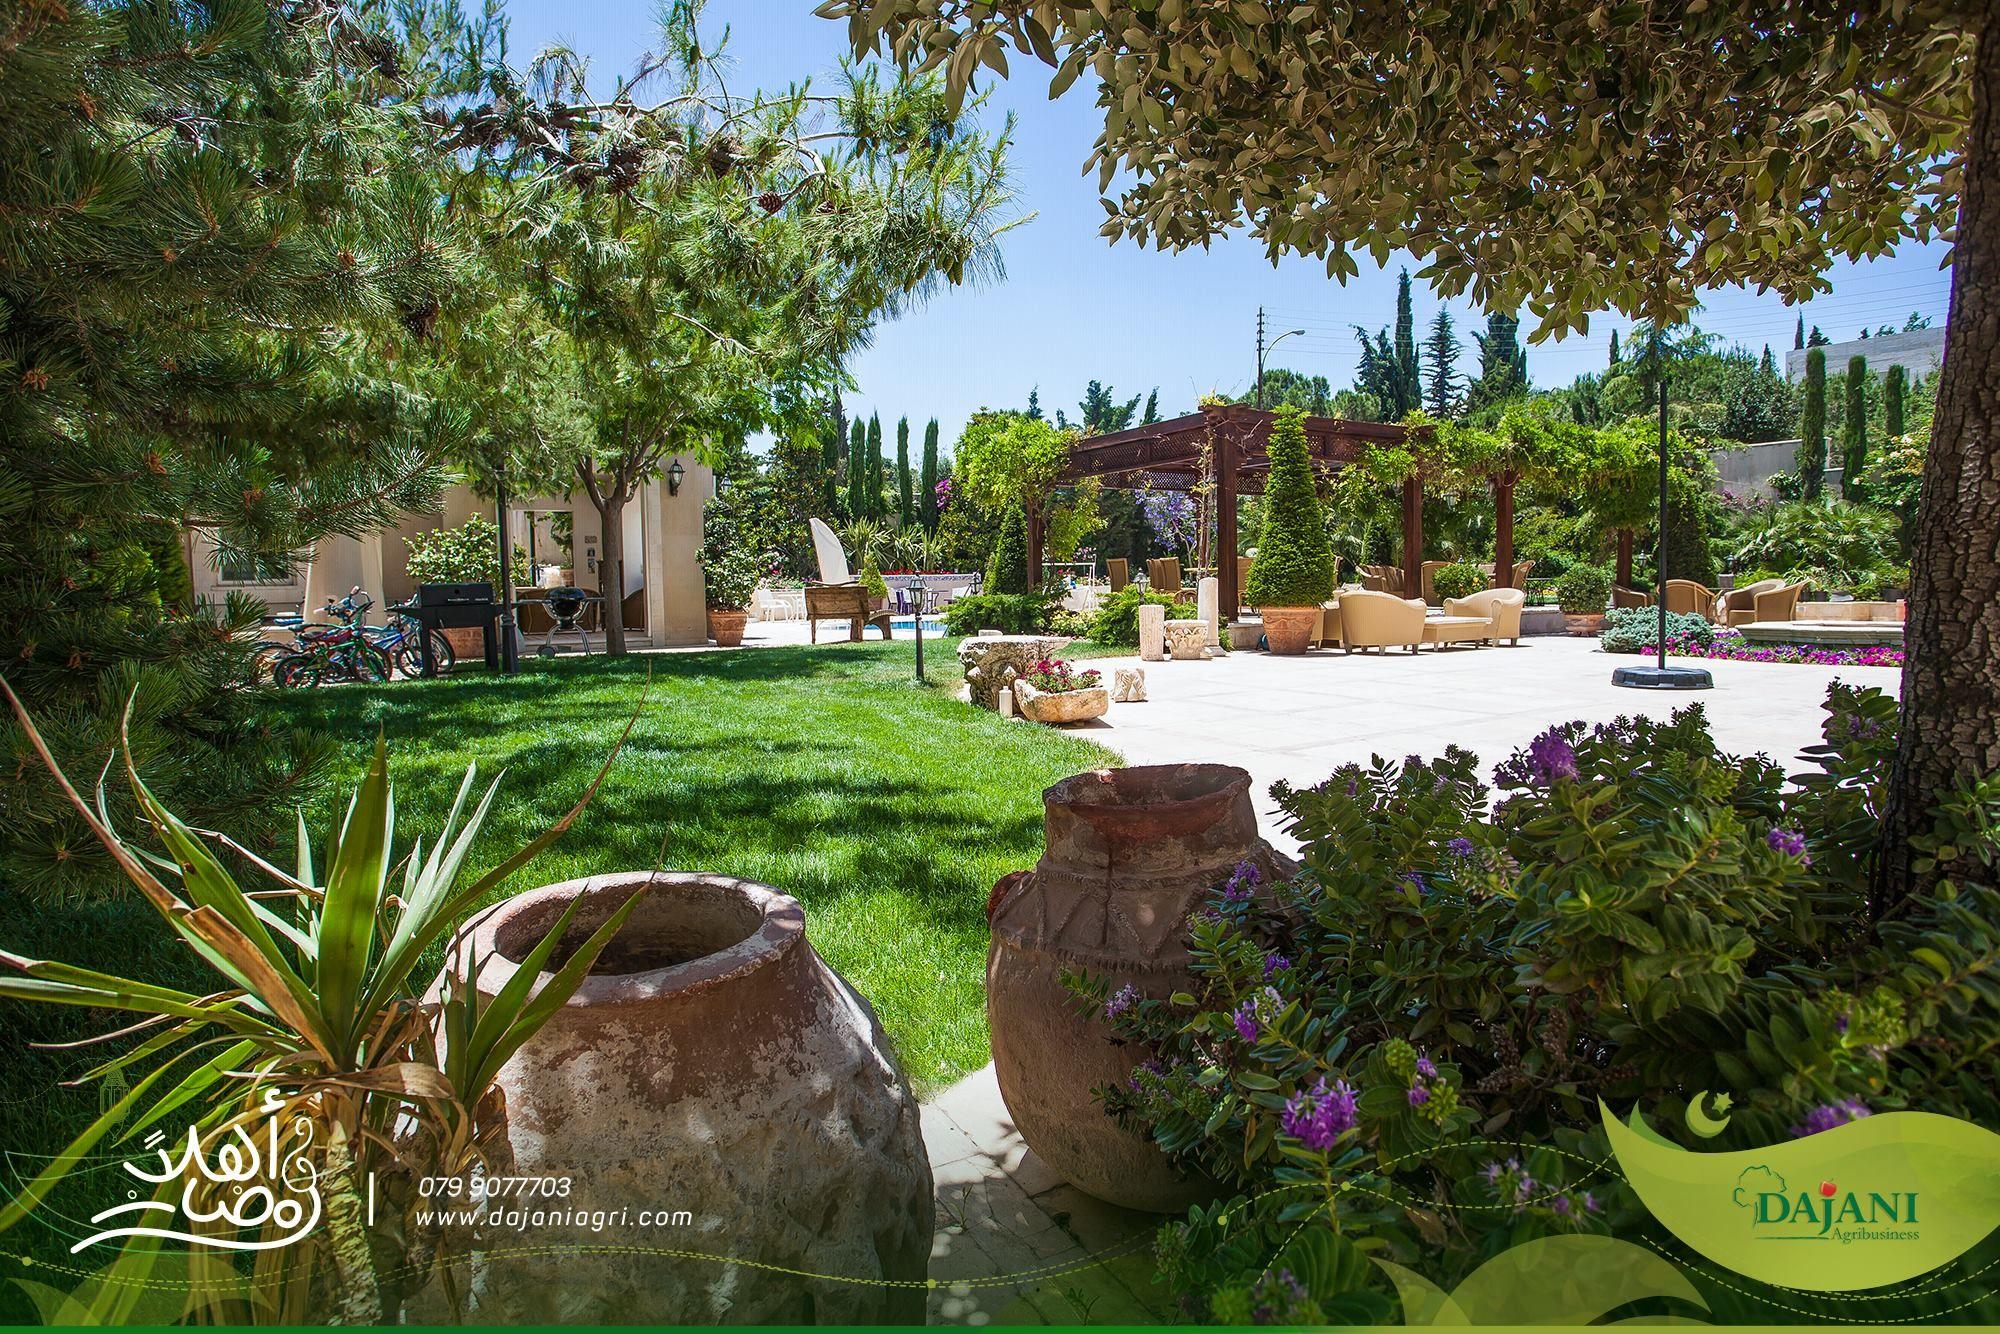 إبداع في التصميم وإتقان في التنفيذ Creativity In Design And Proficiency In Implementation Summer صيف شمس Lawnscape Landscape Plants Pictures